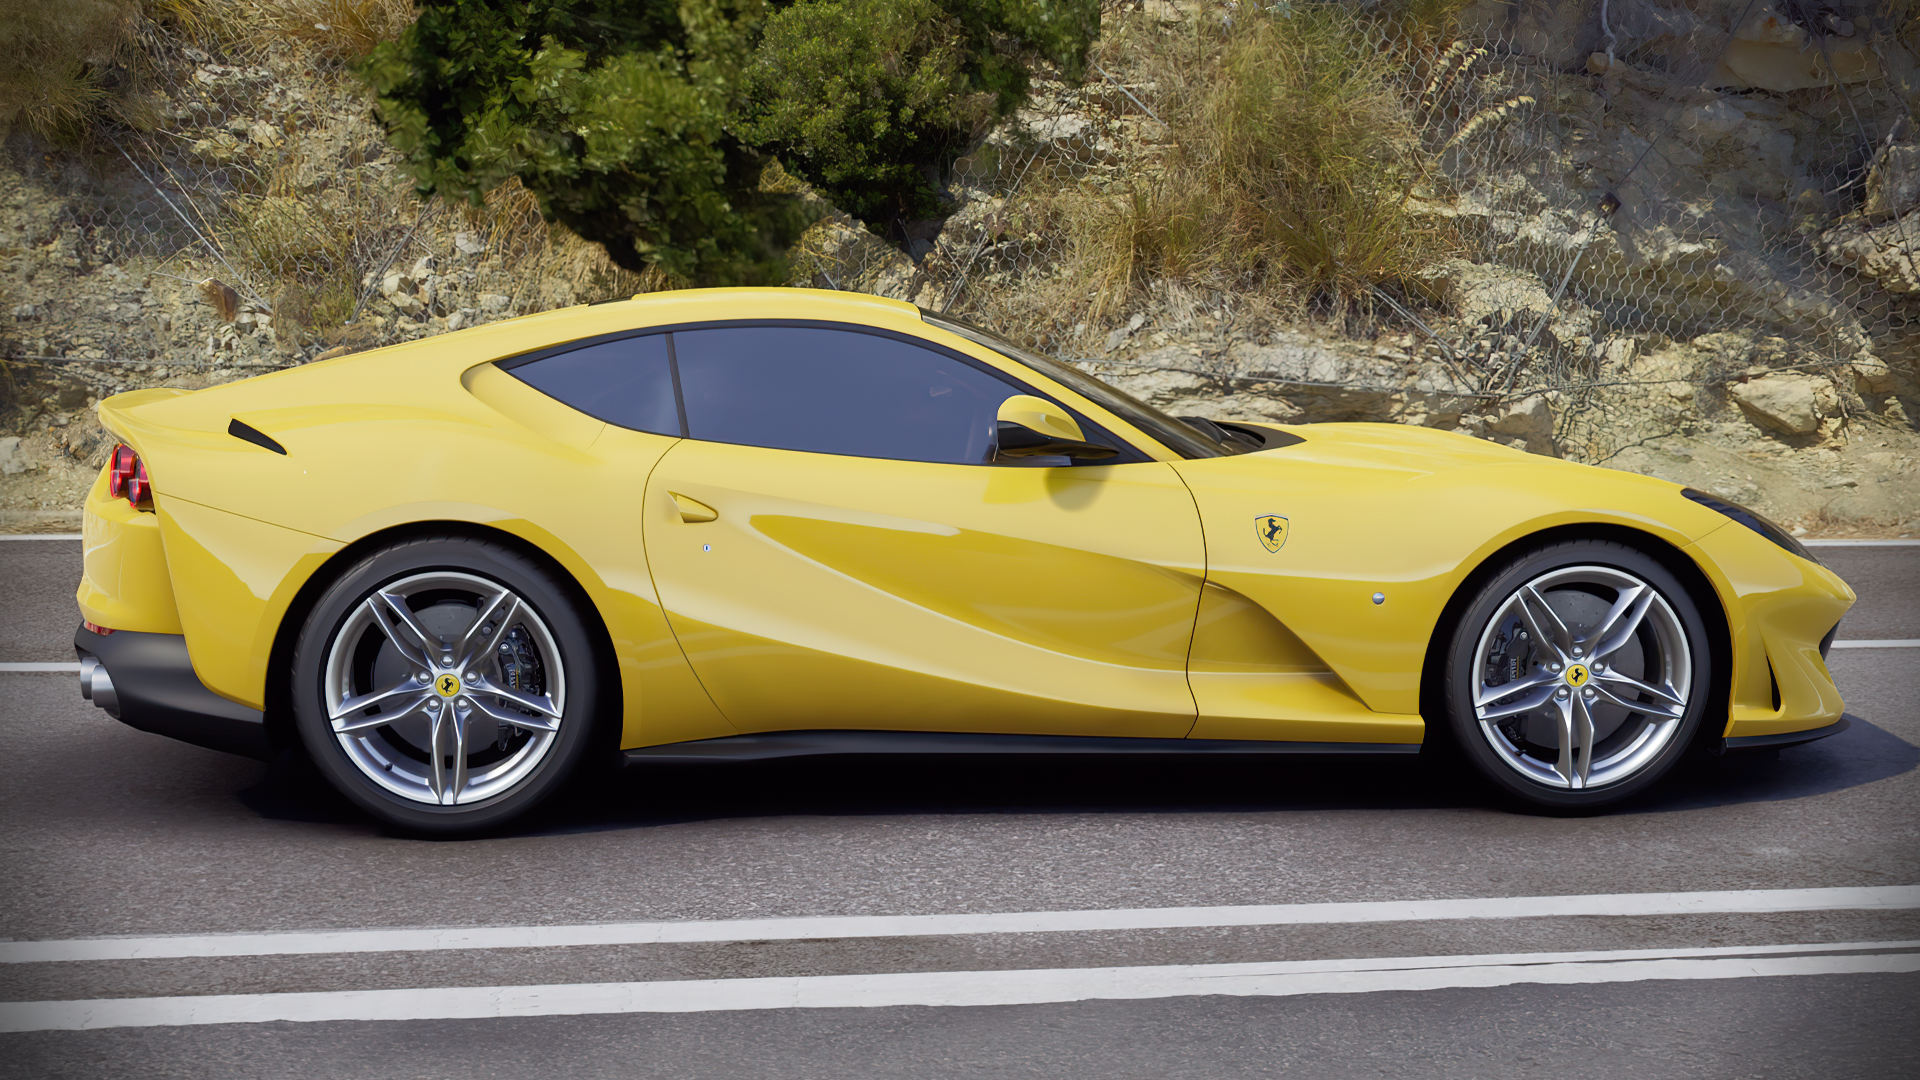 Ferrari Yellow Sports Car Wallpaper